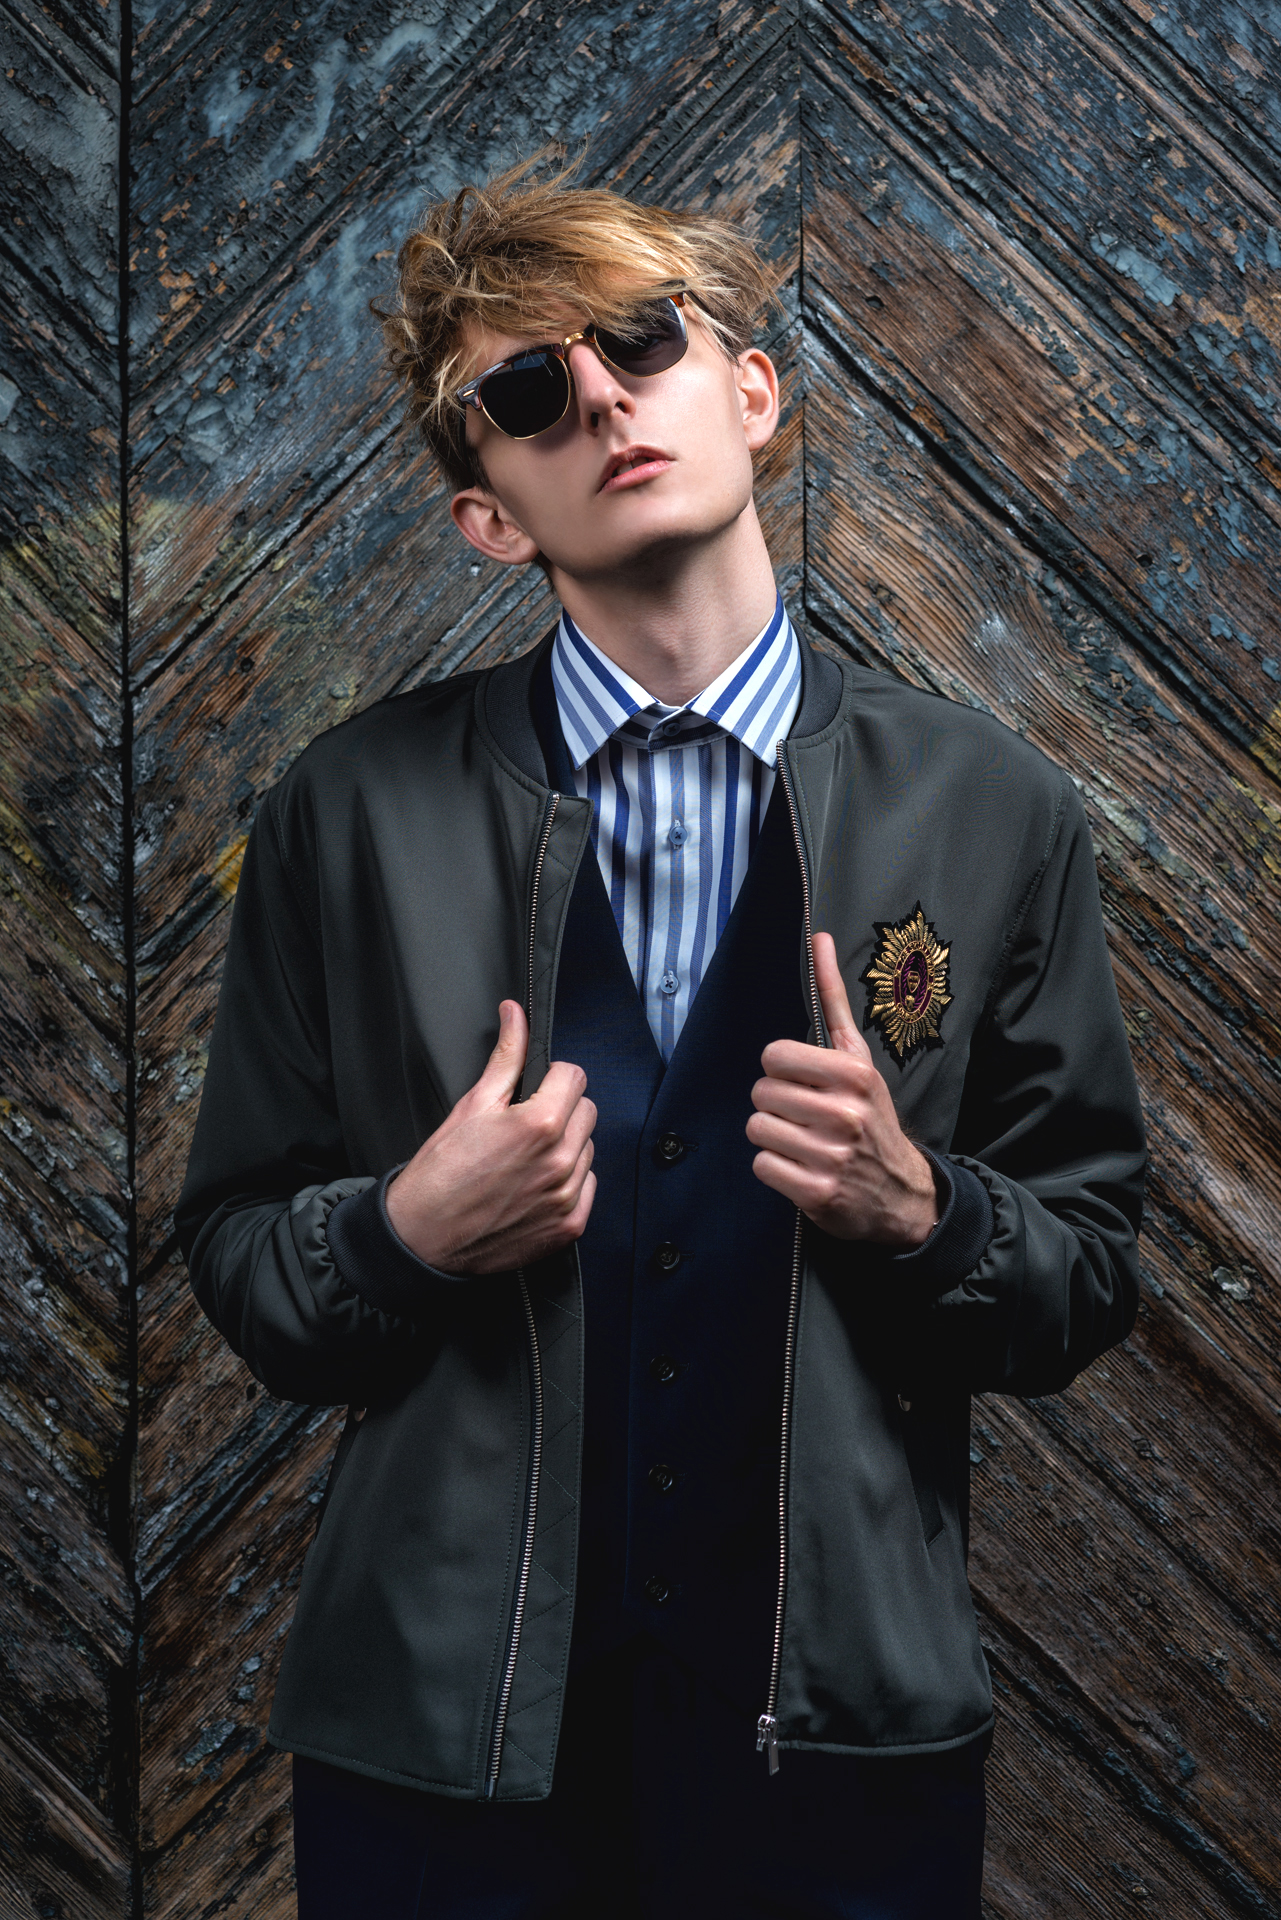 blog-mode-homme-strasbourg-maurice-style-moderniser-costume-galeries-lafayette